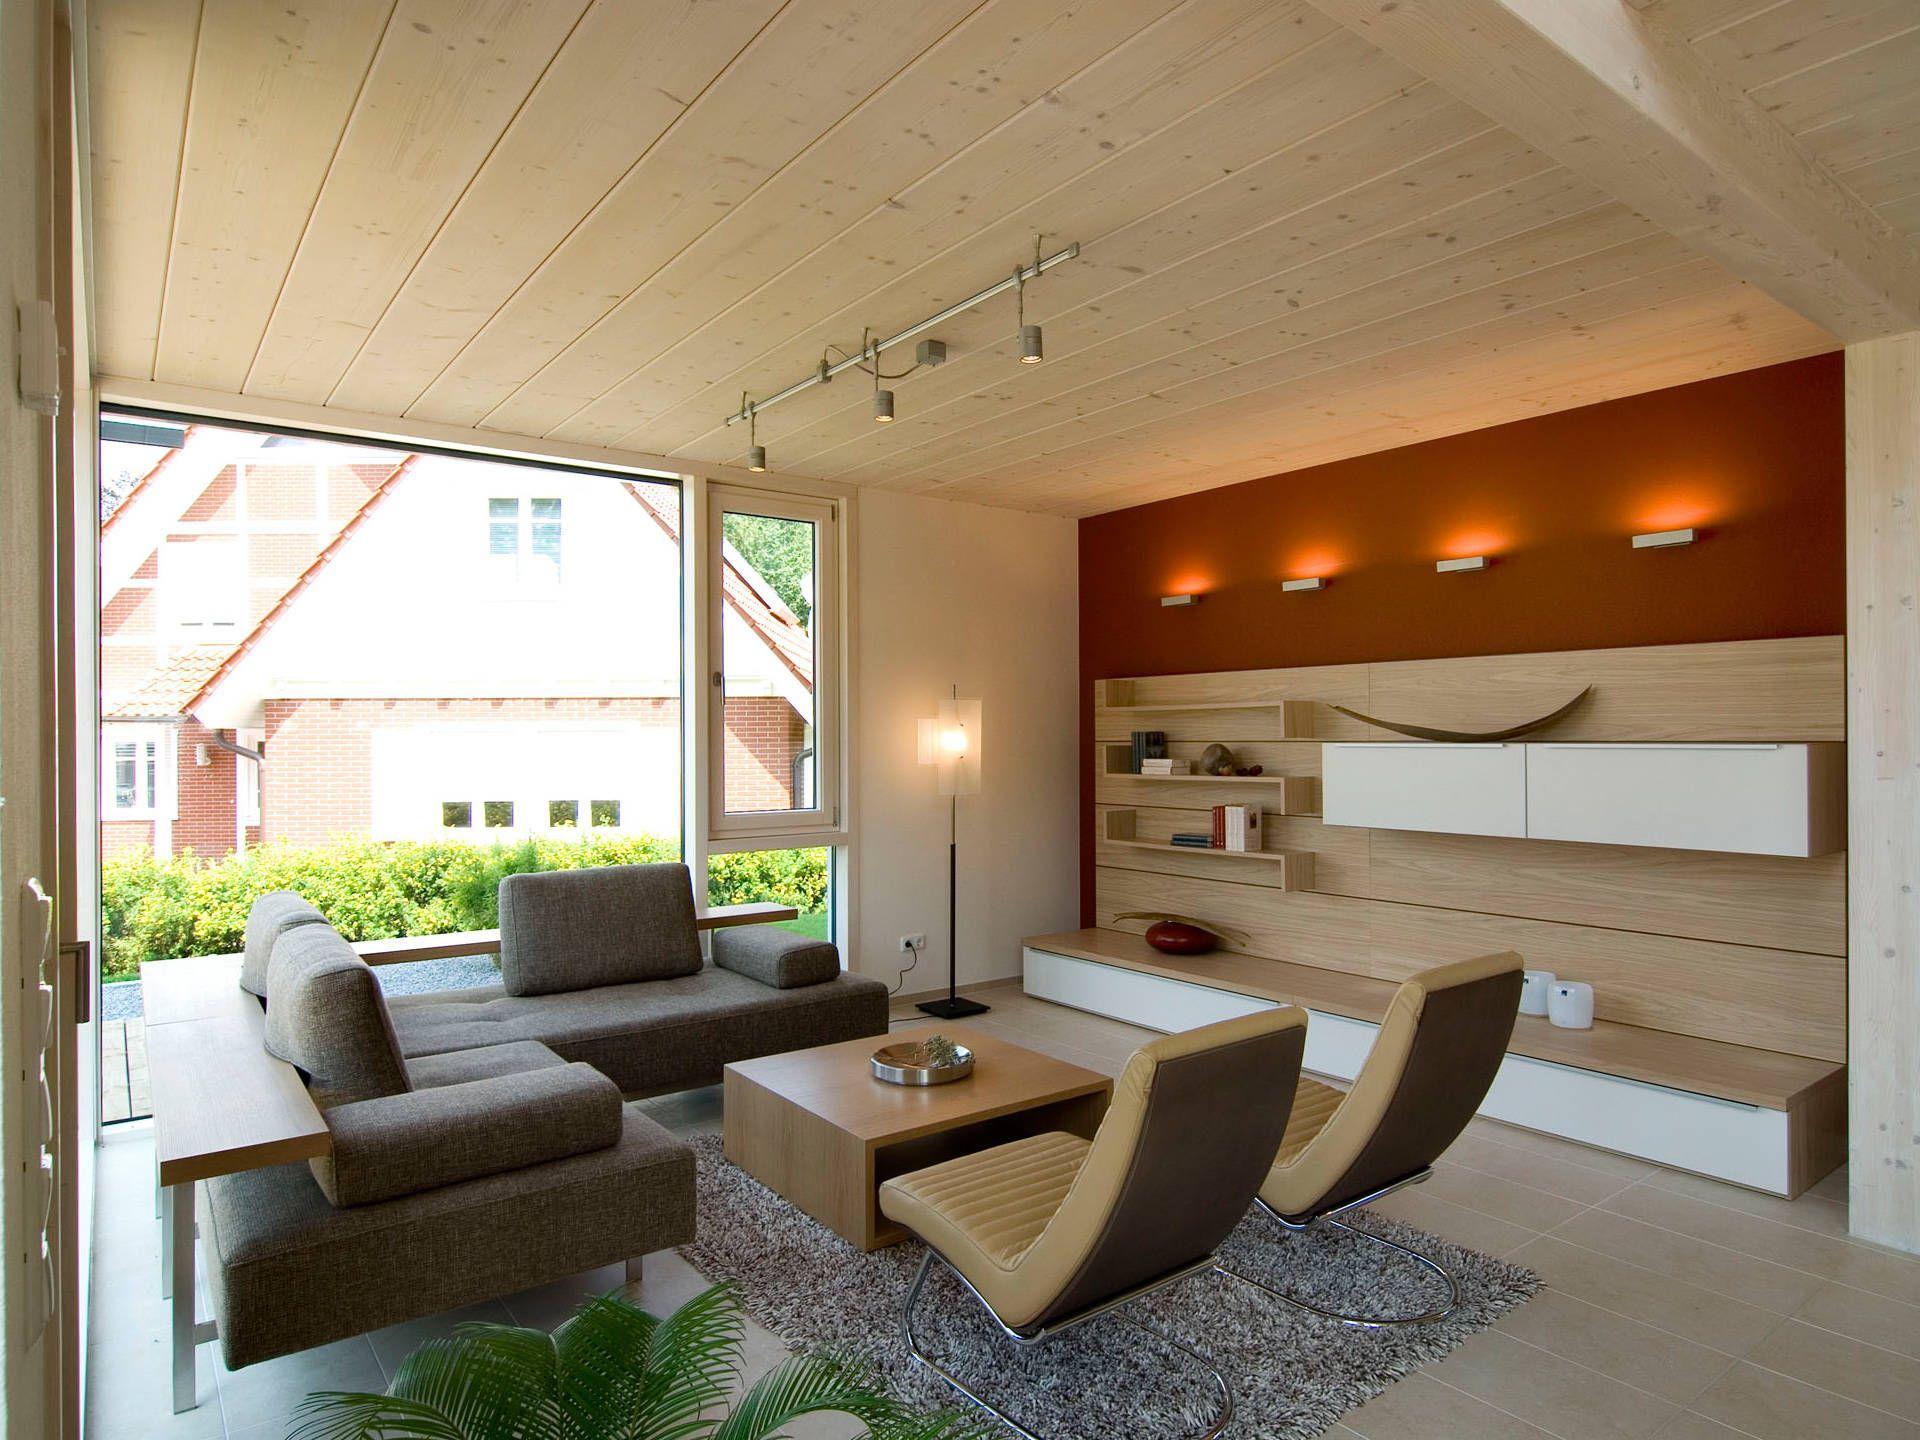 ^ 1000+ ideas about Musterhauspark on Pinterest Danhaus ...